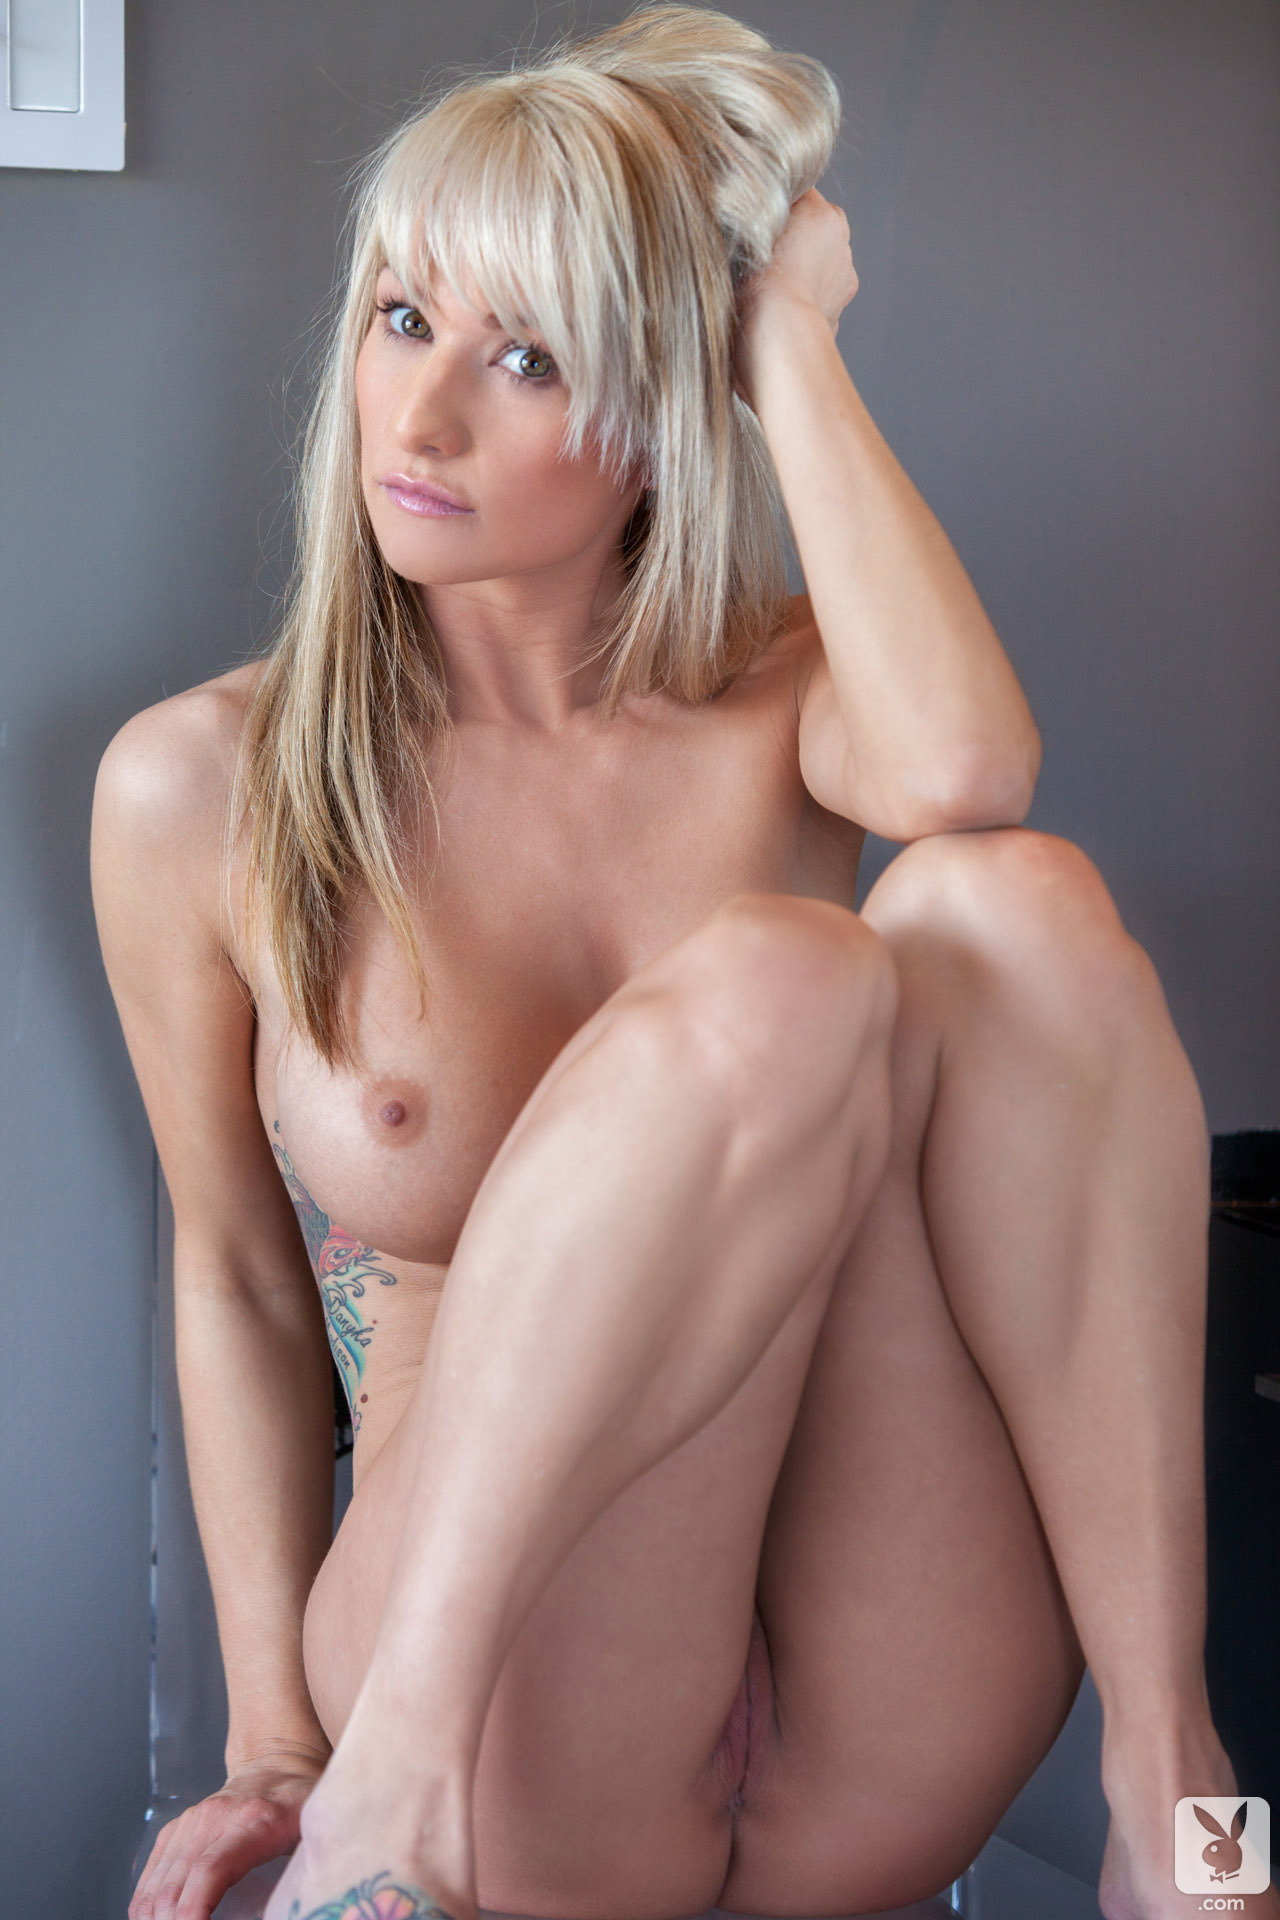 jessie-ann-blonde-boobs-bathtube-naked-playboy-09